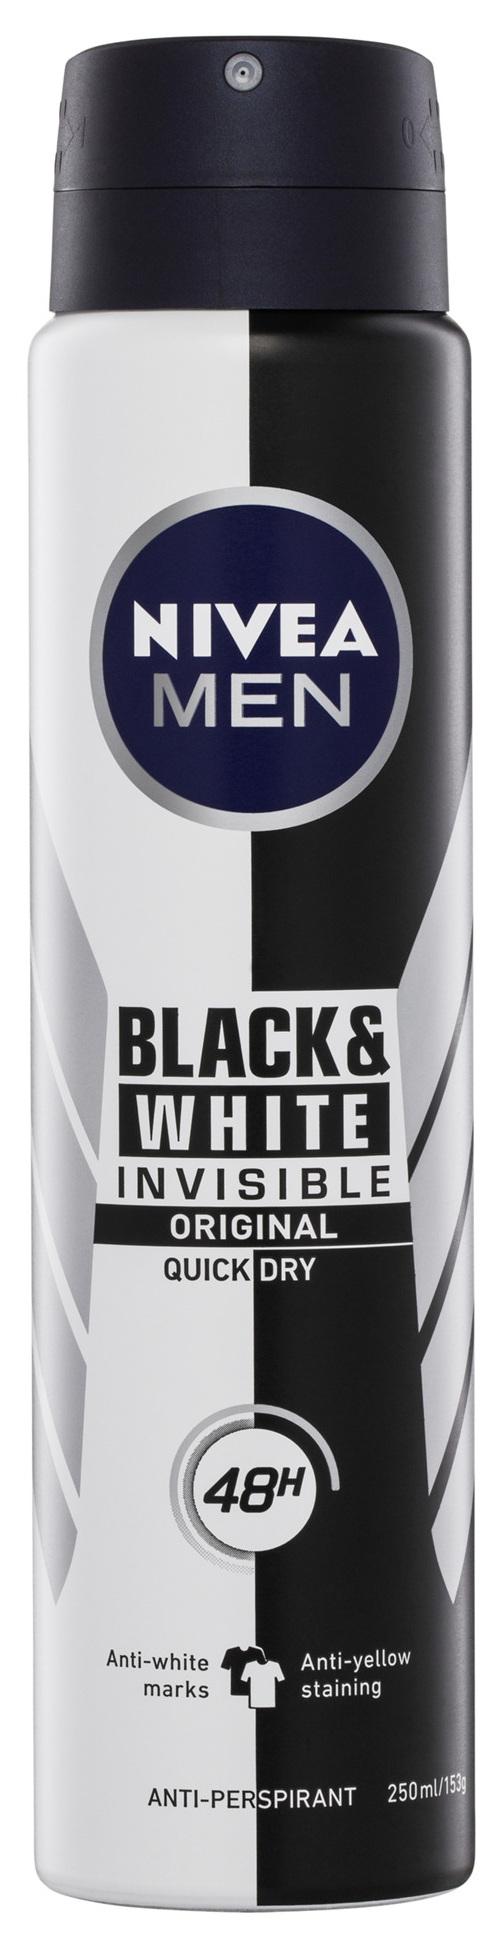 NIVEA MEN Invisible Black & White Power Aerosol Deodorant 250ml